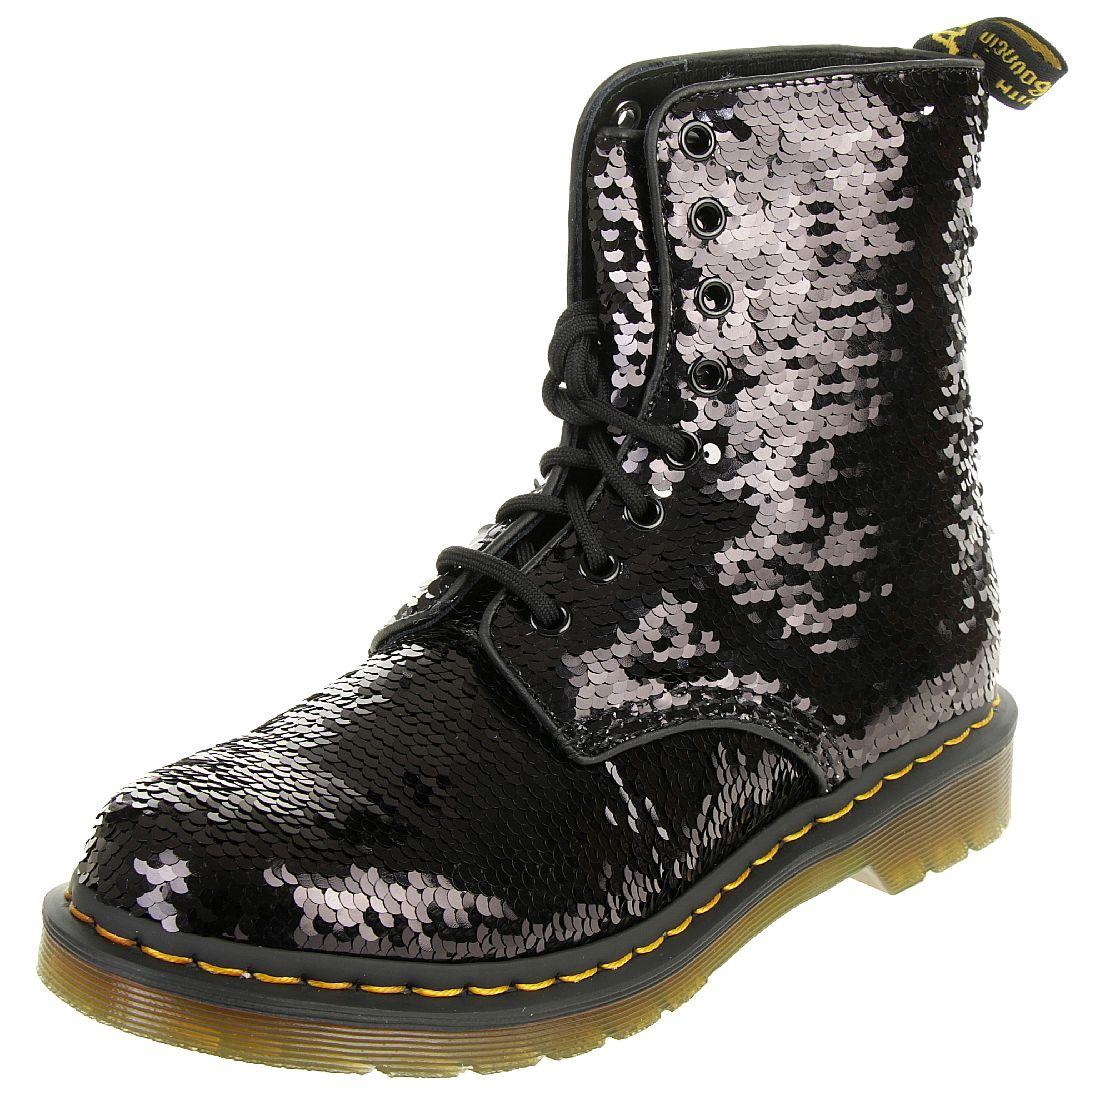 1460 Schwarz Damen Pascal Boots Sequin DrMartens Stiefel w8NOnvm0